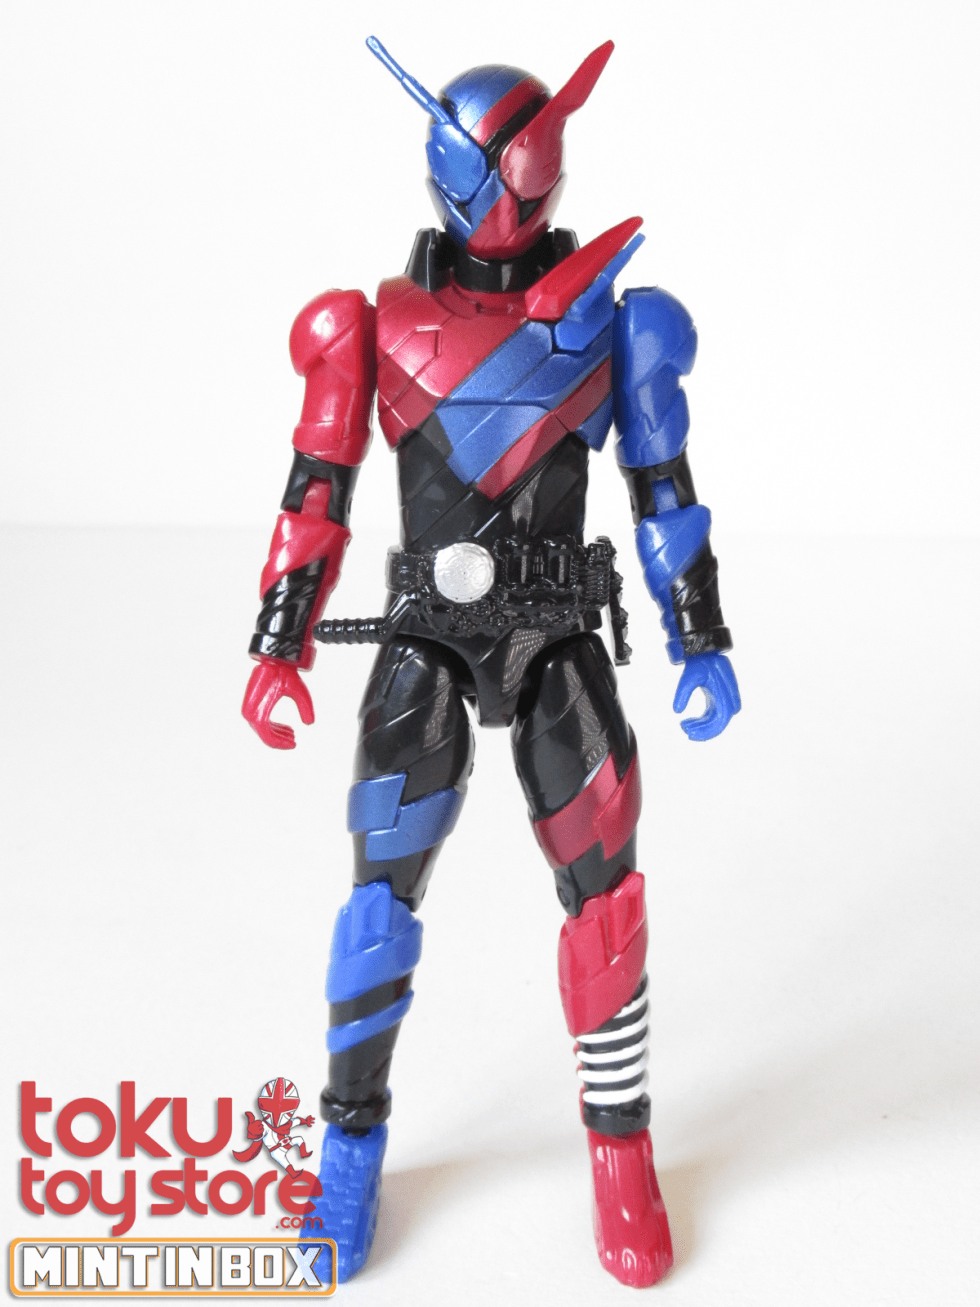 RKF_Kamen Rider Build_Toku Toy Store (1)